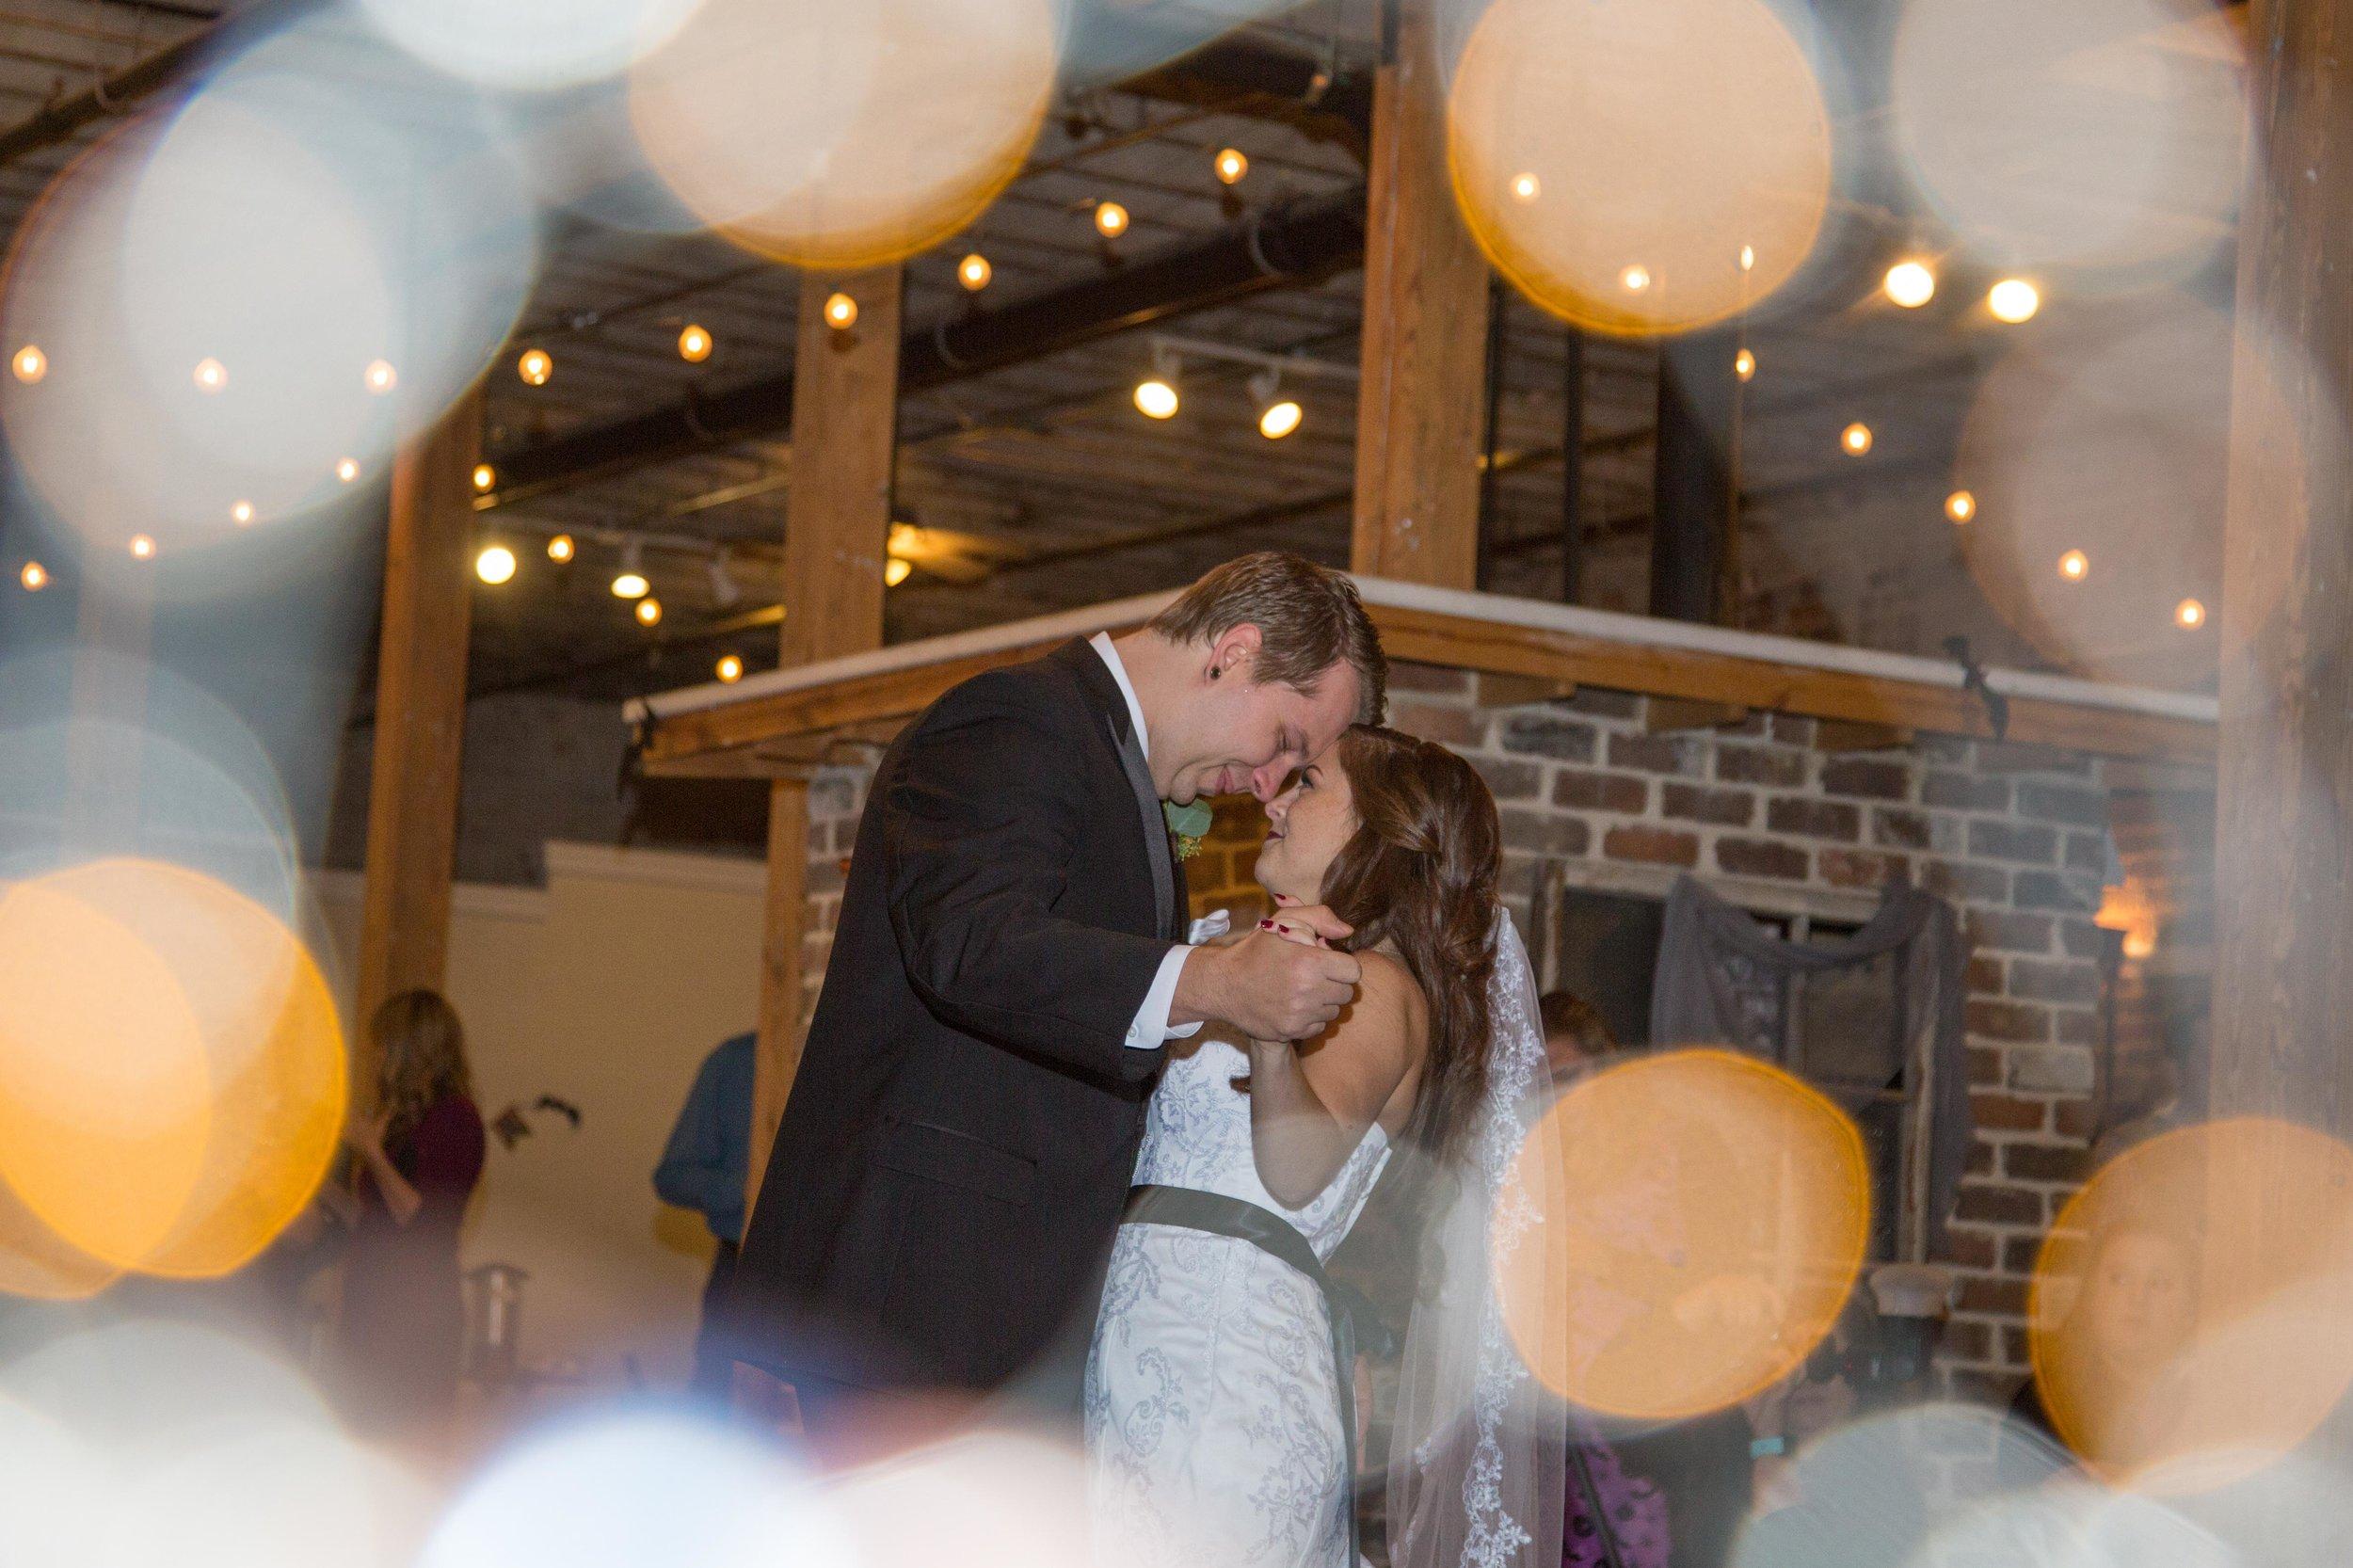 00001_Parker-Wedding-Sp-86.jpg